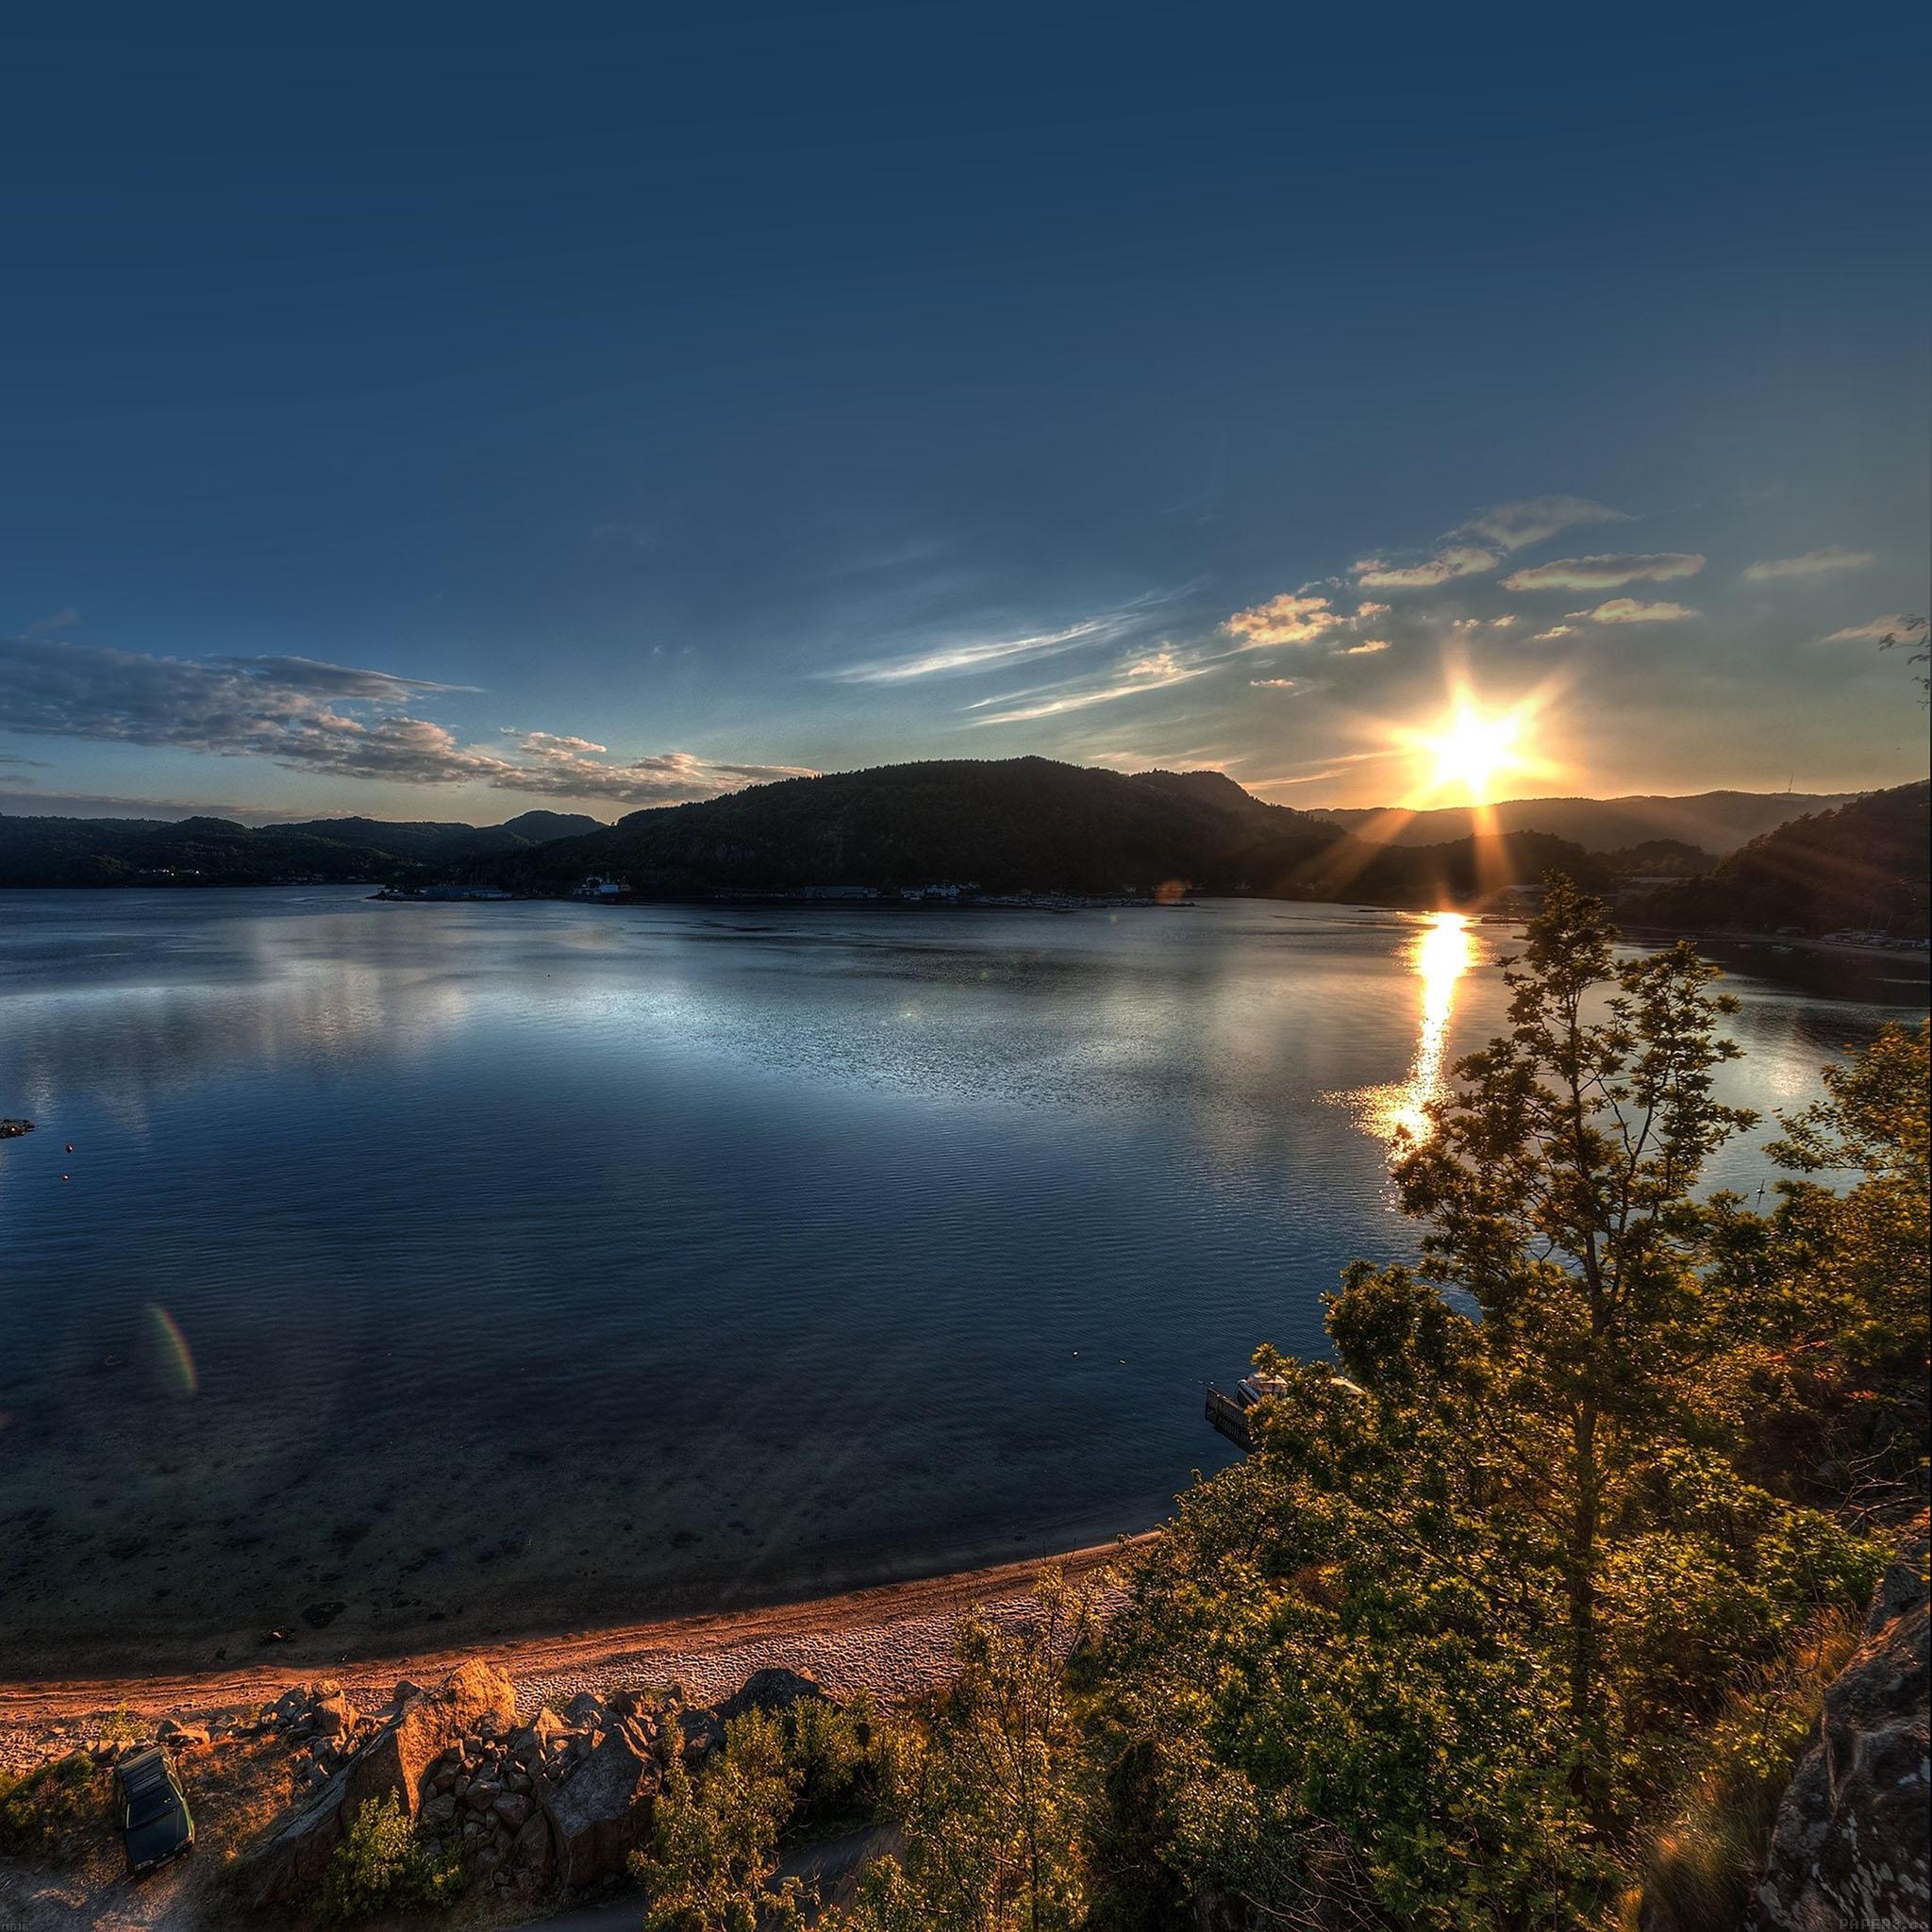 lake essay